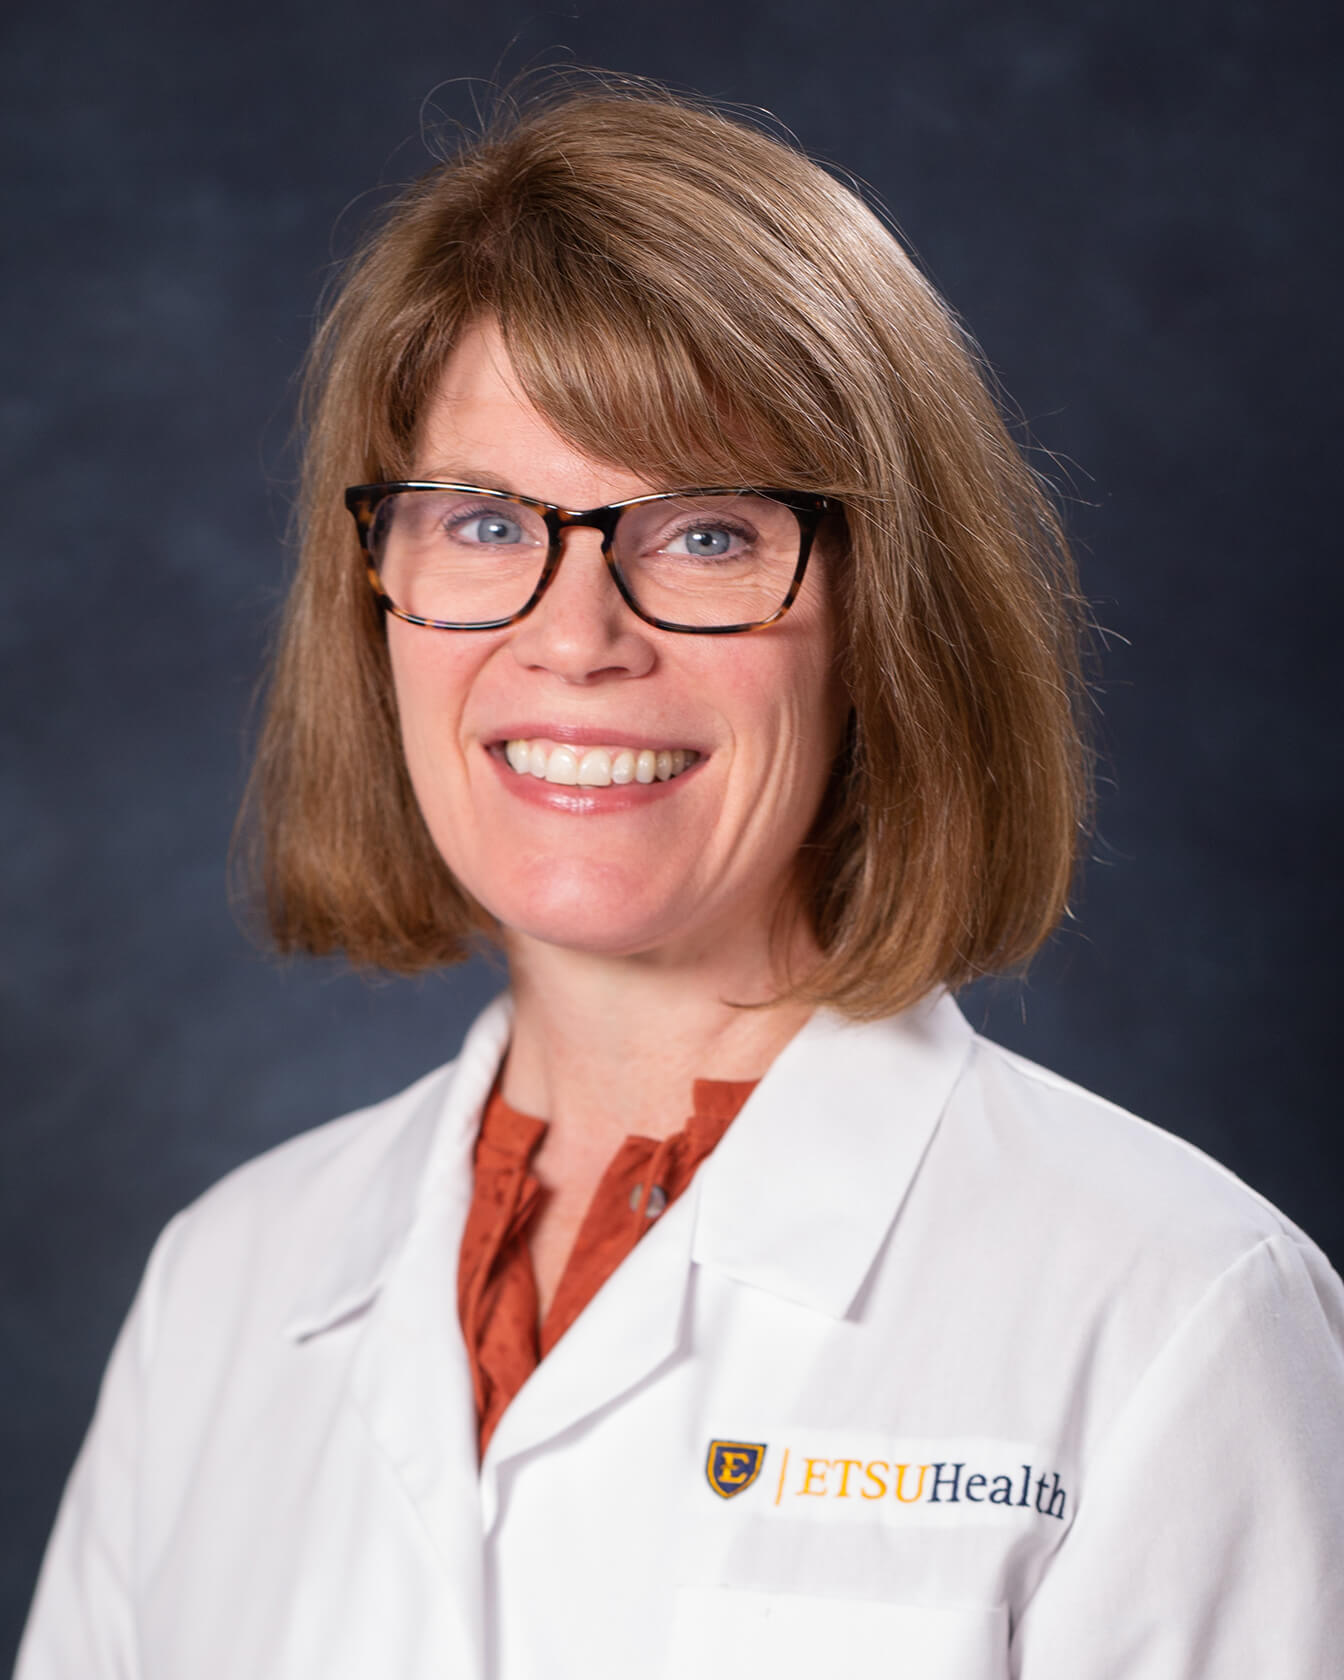 Photo of Evelyn Artz, M.D.